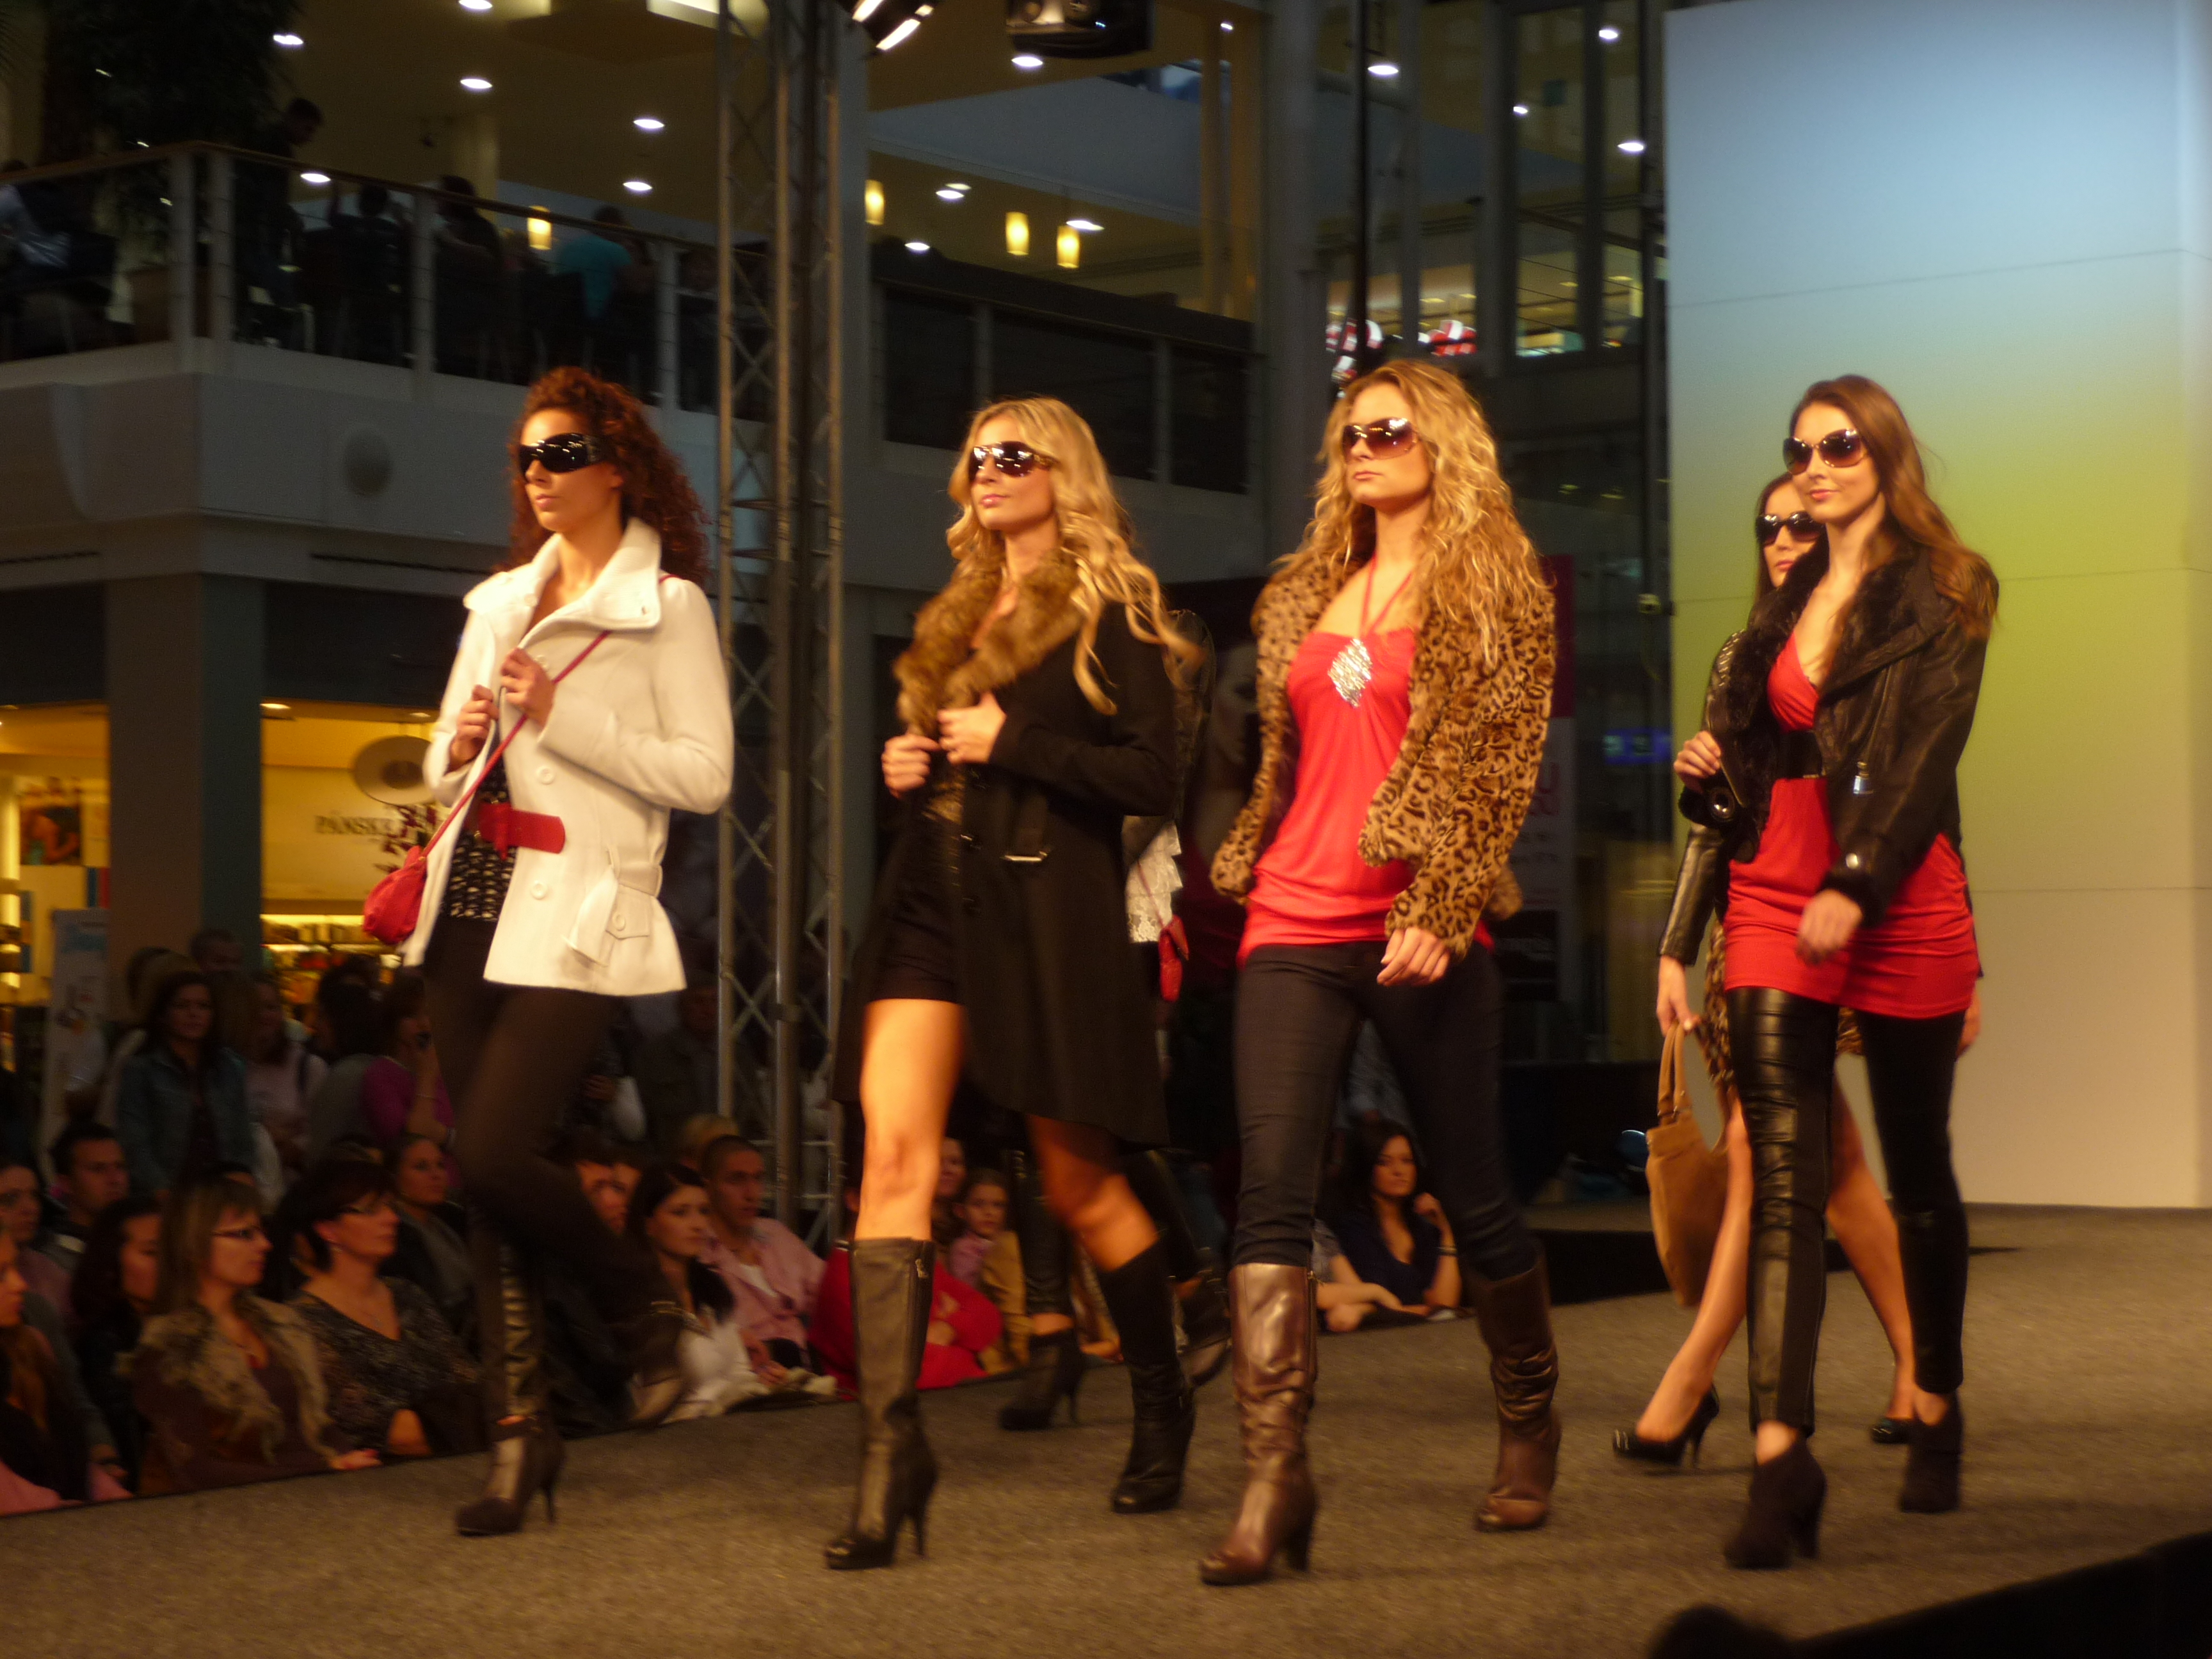 File Olympia Fashion Show 2010 22 Jpg Wikimedia Commons